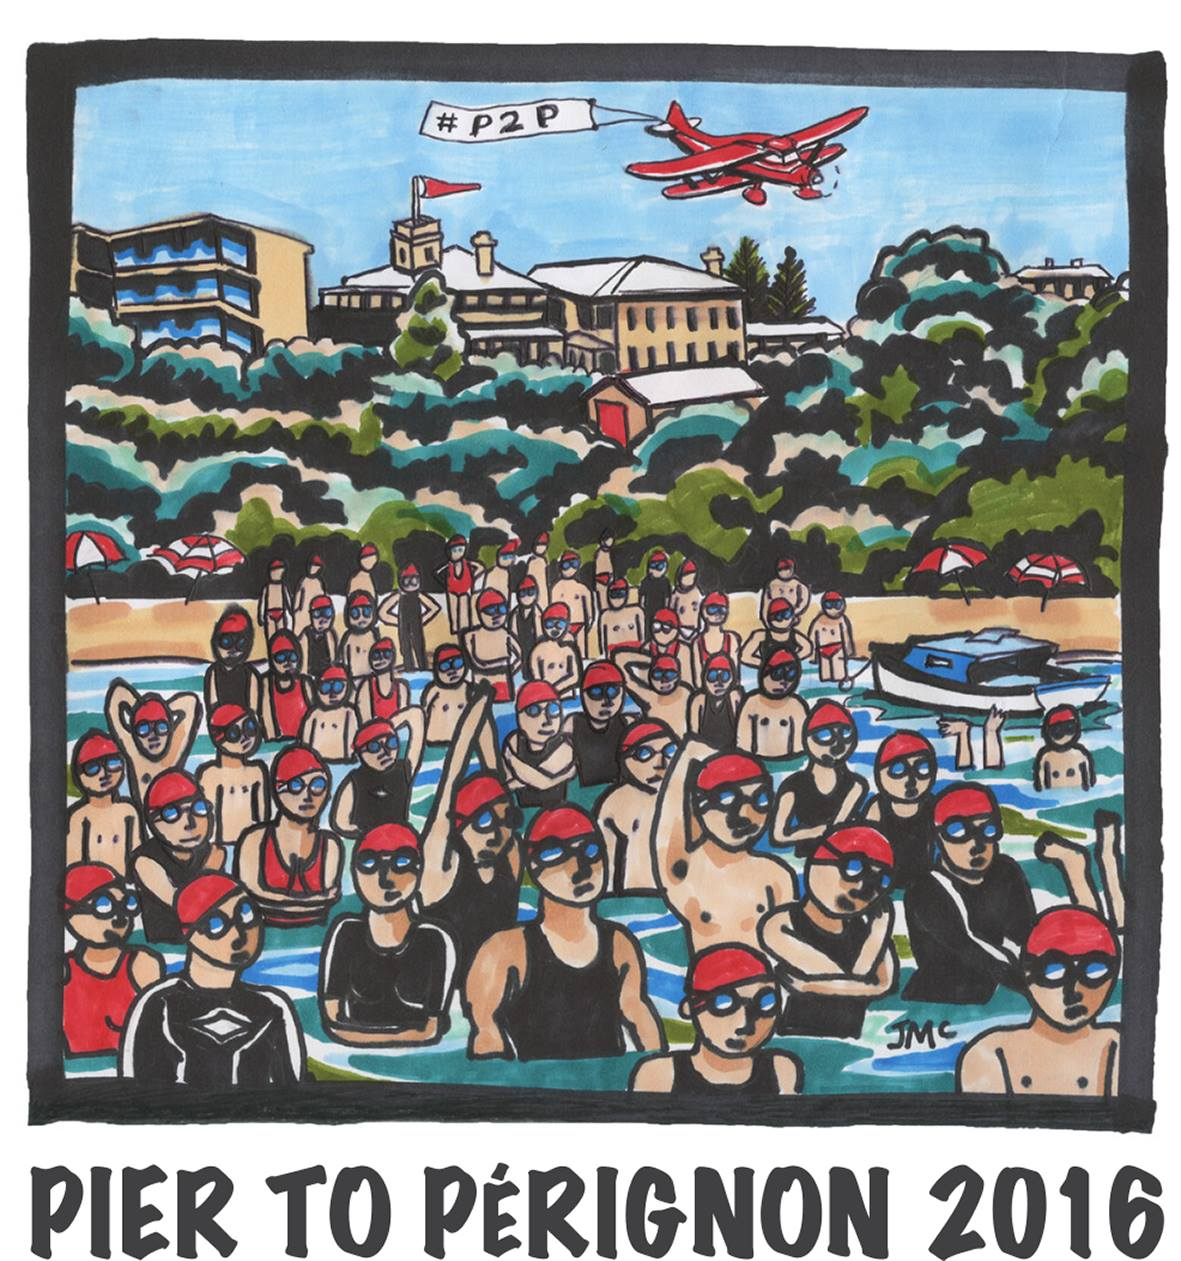 At the Pier to Pérignon swim